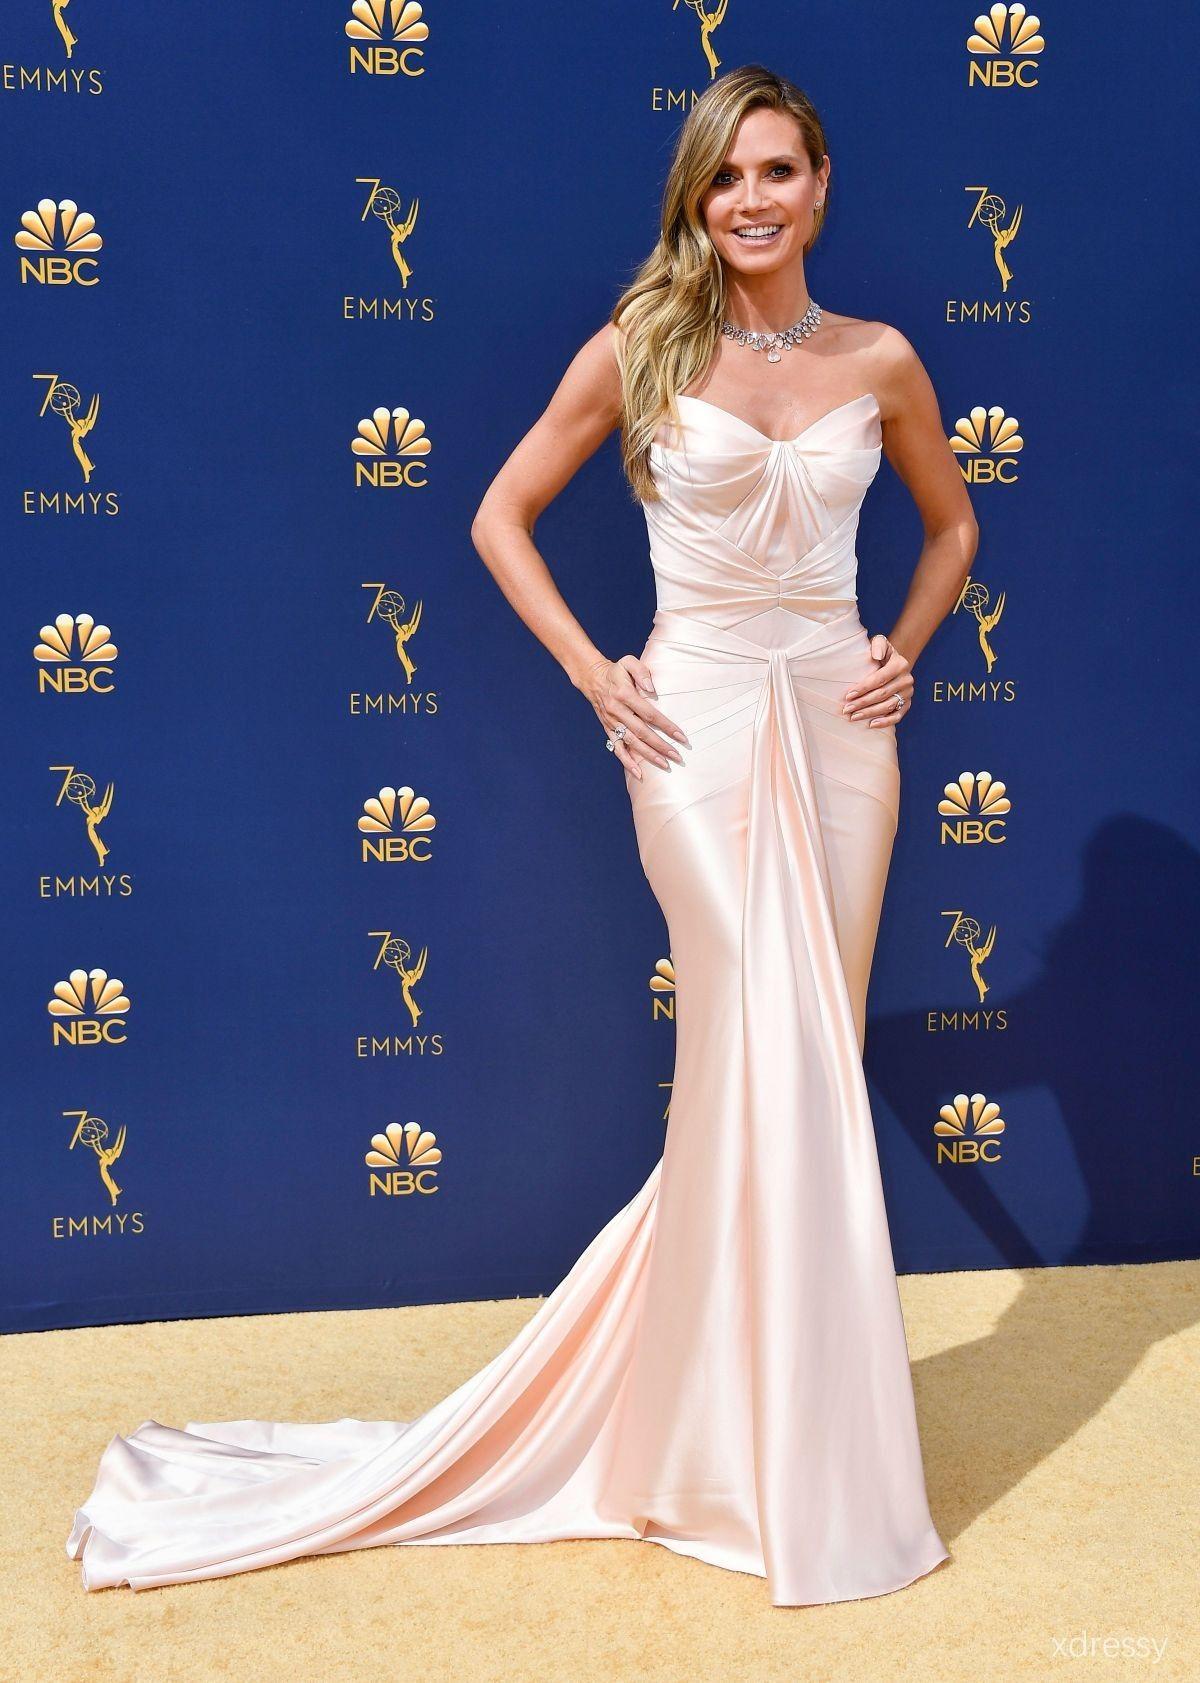 70c8c4d4639 Heidi Klum Blush Satin Strapless Mermaid Long Evening Gown Emmys 2018 Red  Carpet